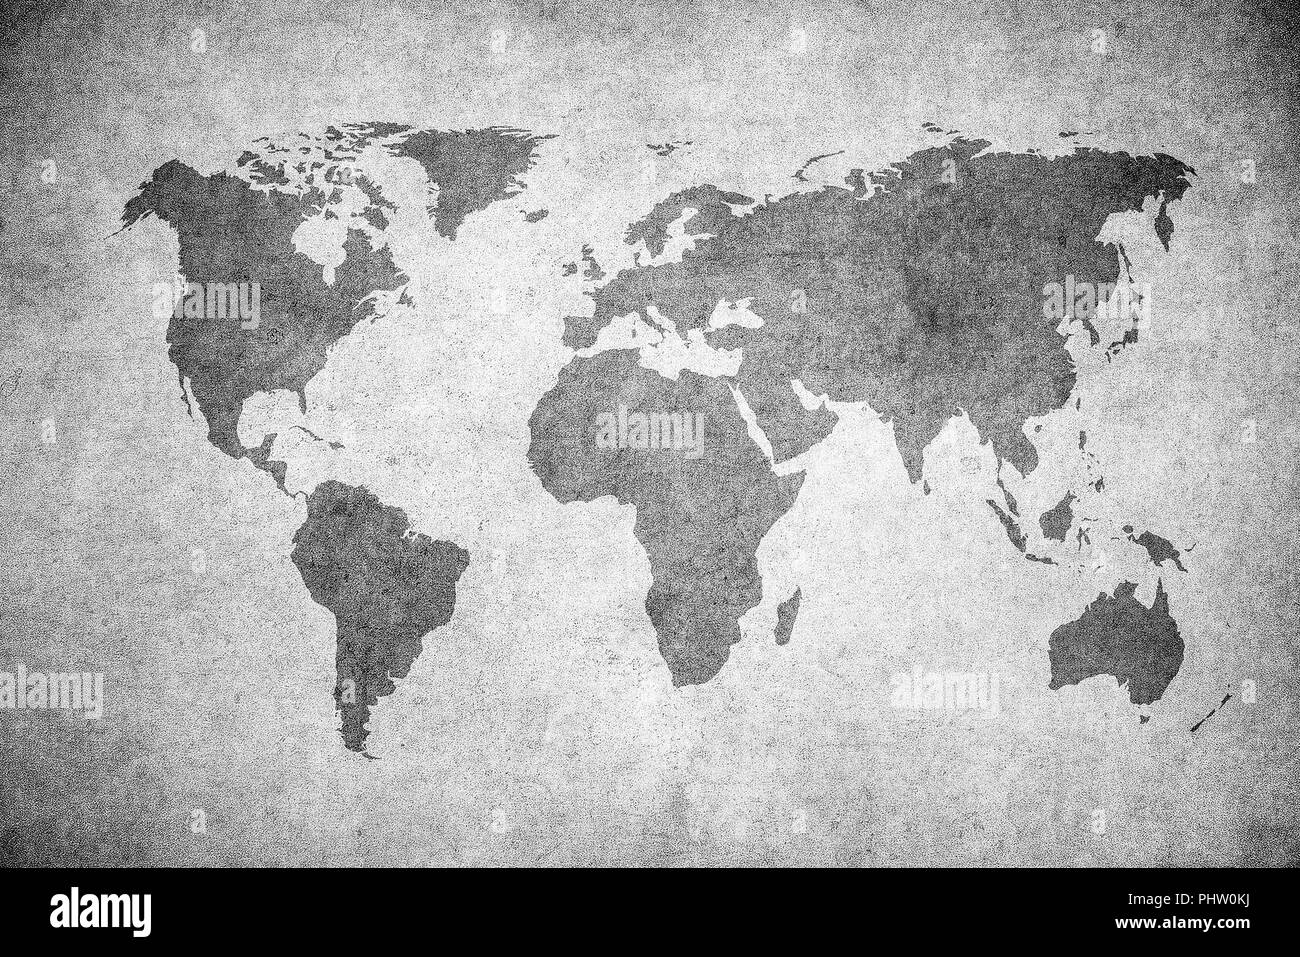 grunge map of the world - Stock Image